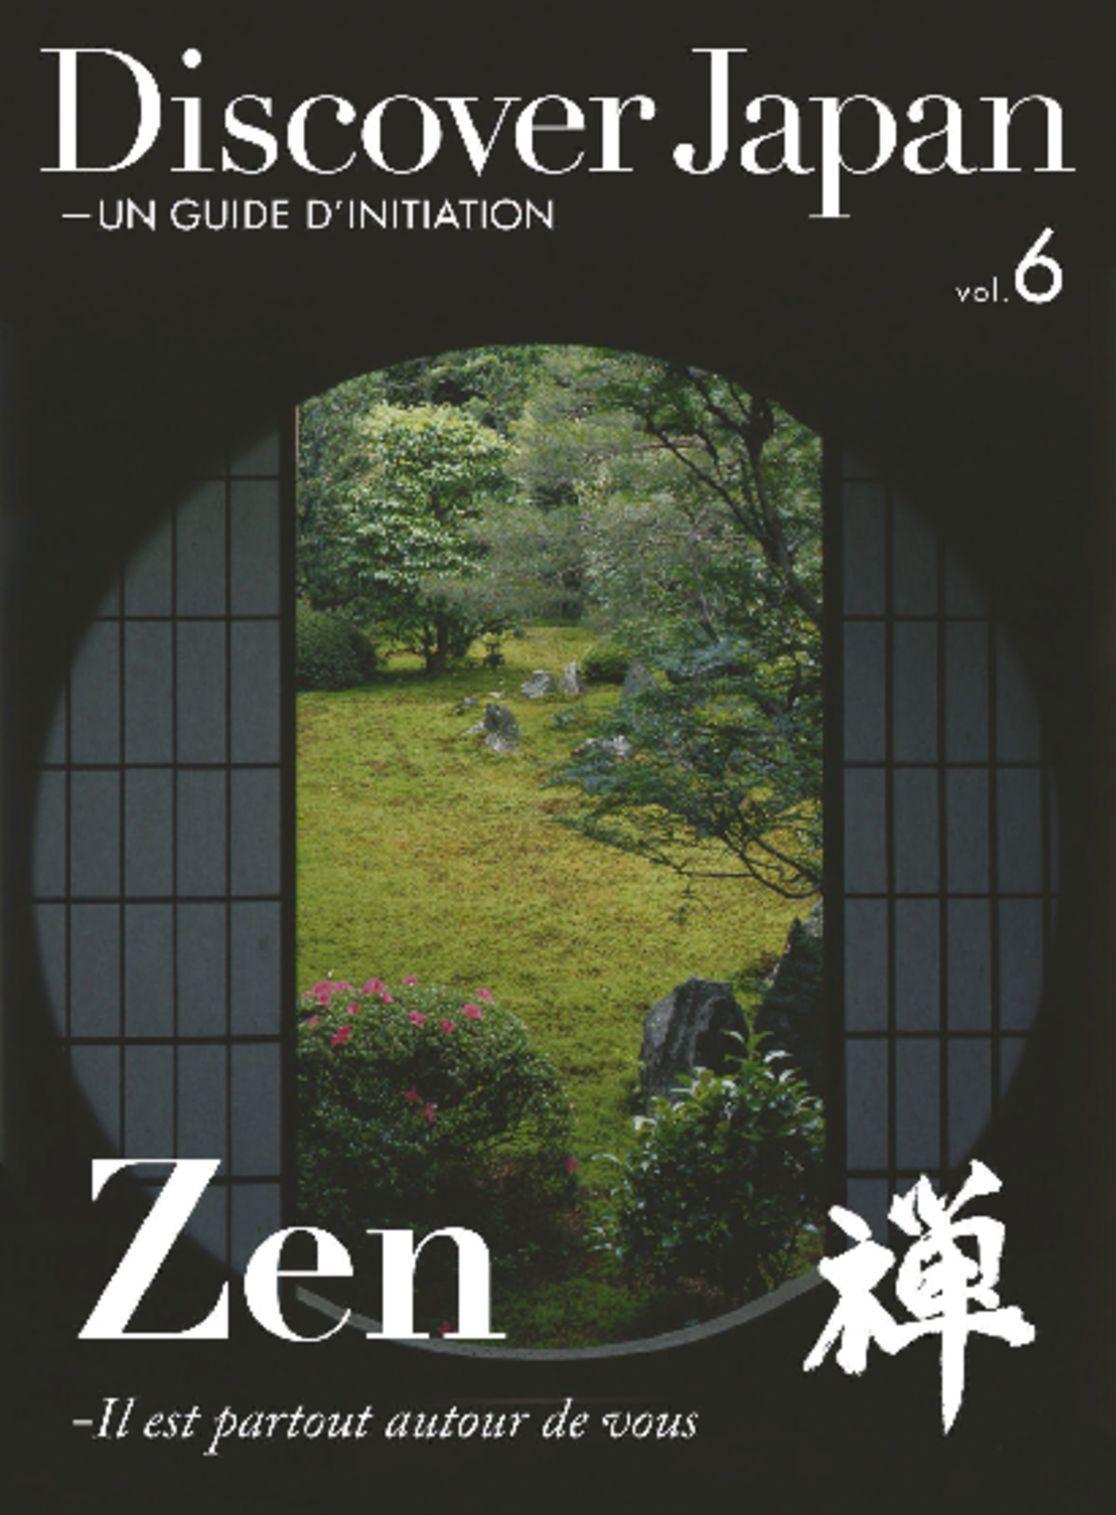 Discover Japan UN GUIDE DINITIATION Digital